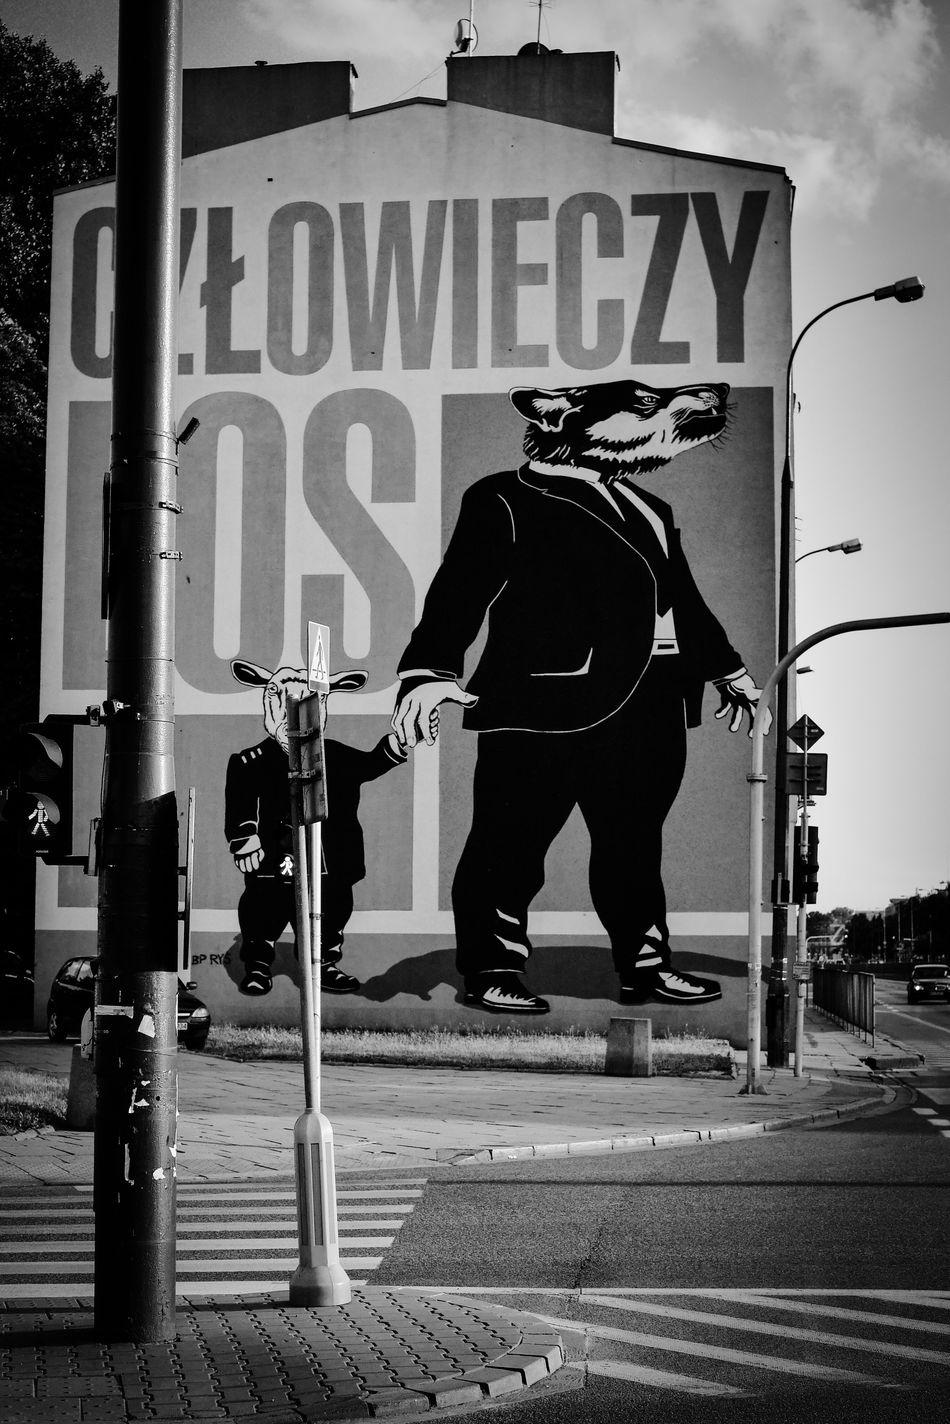 Streetphotography Black And White EyeEm Blackandwhite Light And Shadow My Photography Eye4photography  My Point Of View Eyemphotography Warsaw Poland Eyem Gallery Panasonic Lumix Eyemday Eyemstreetphoto Eyem Best Shots - Black + White Streetphoto_bw Outdoors